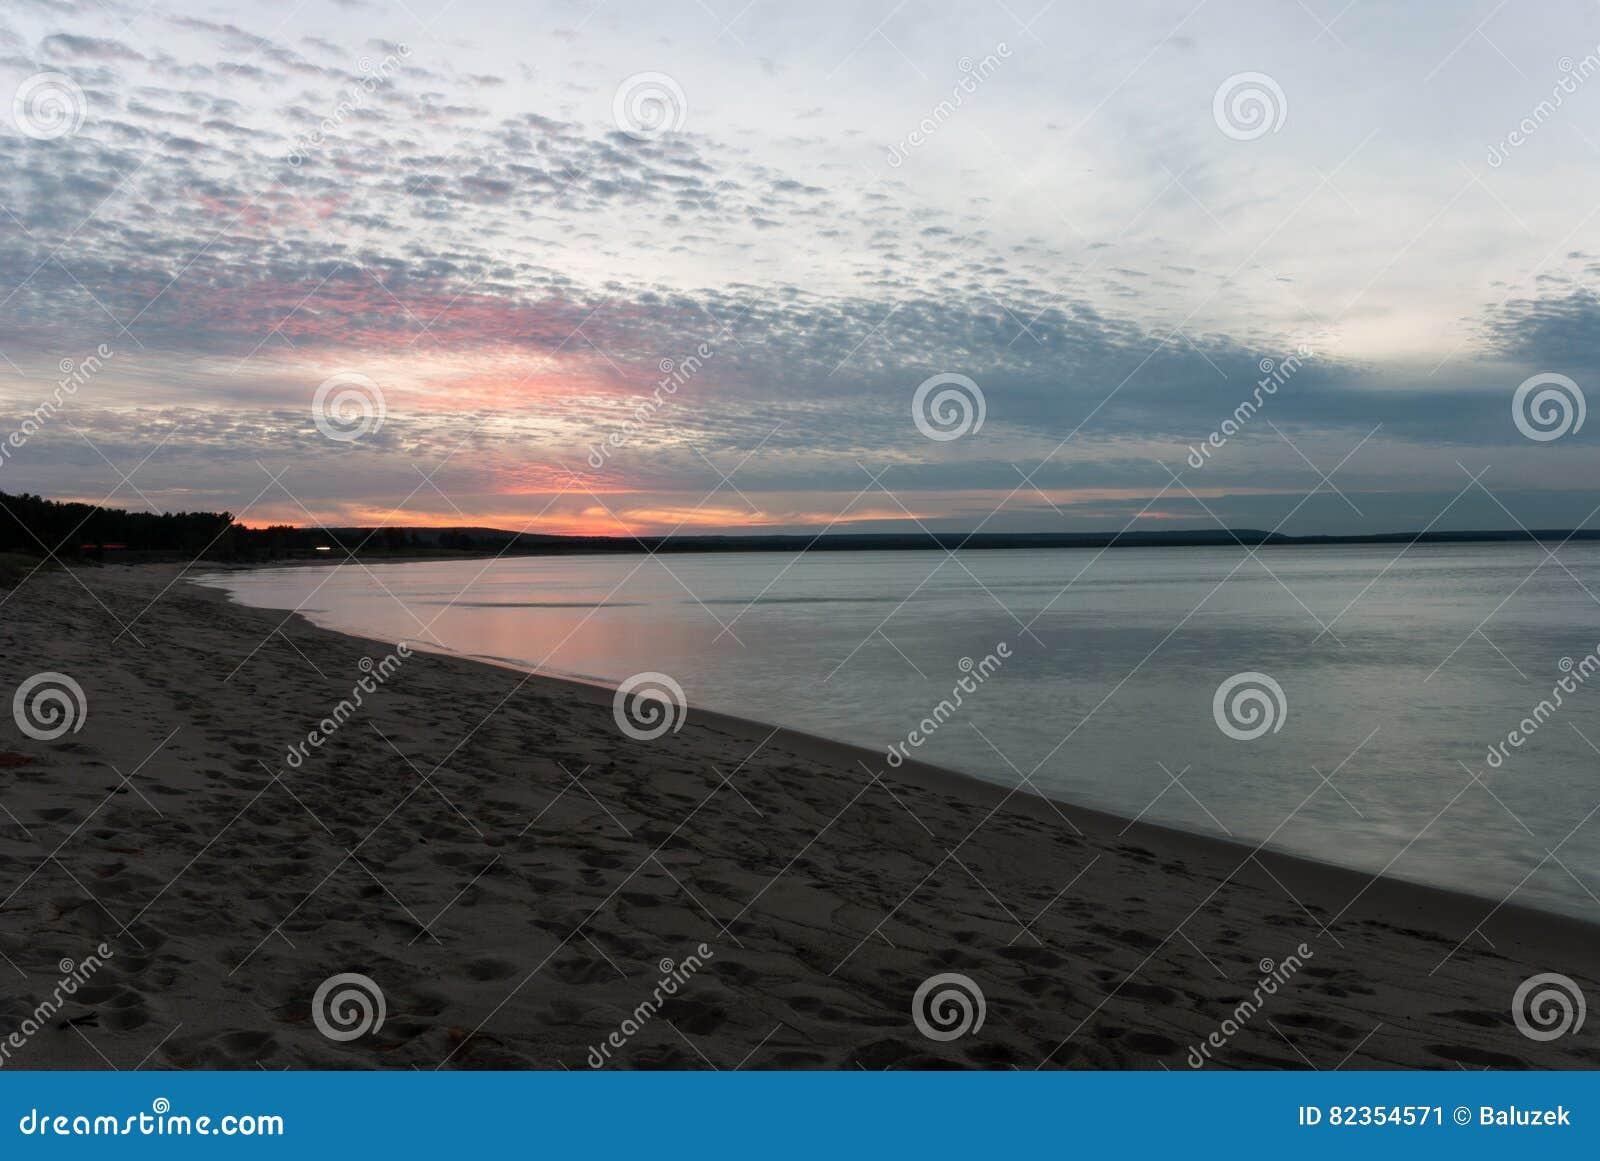 Michigan alger county munising - Sunset On Lake Superior Munising Michigan Stock Photo